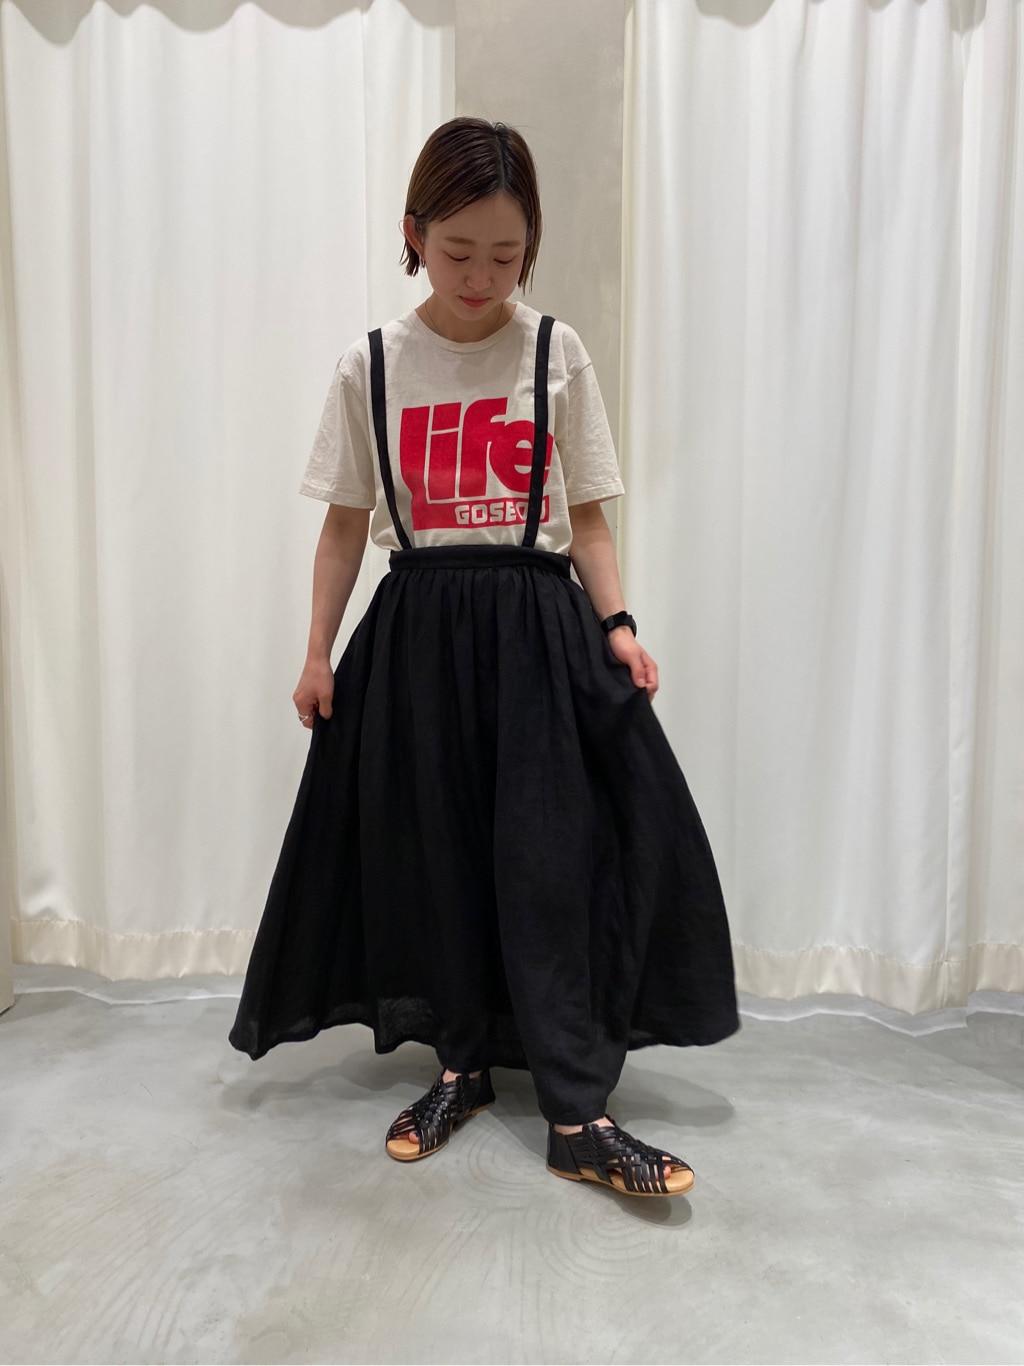 CHILD WOMAN , PAR ICI 東京スカイツリータウン・ソラマチ 2020.07.06